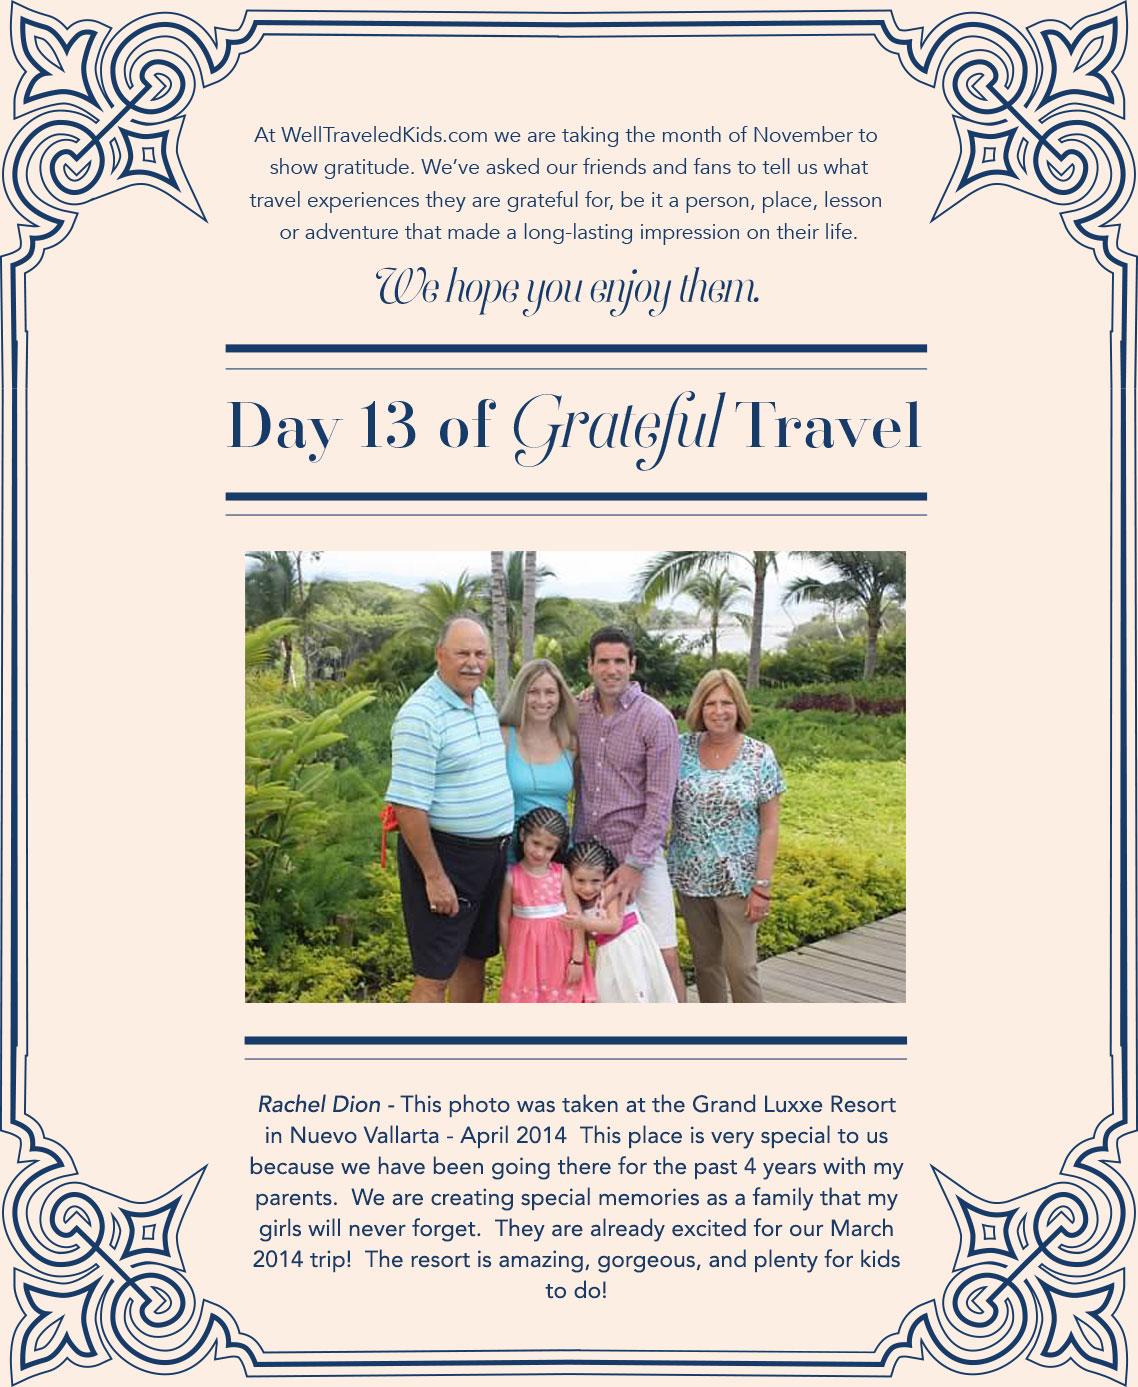 30 Days Of Grateful Travel - Day 11-20 Recap